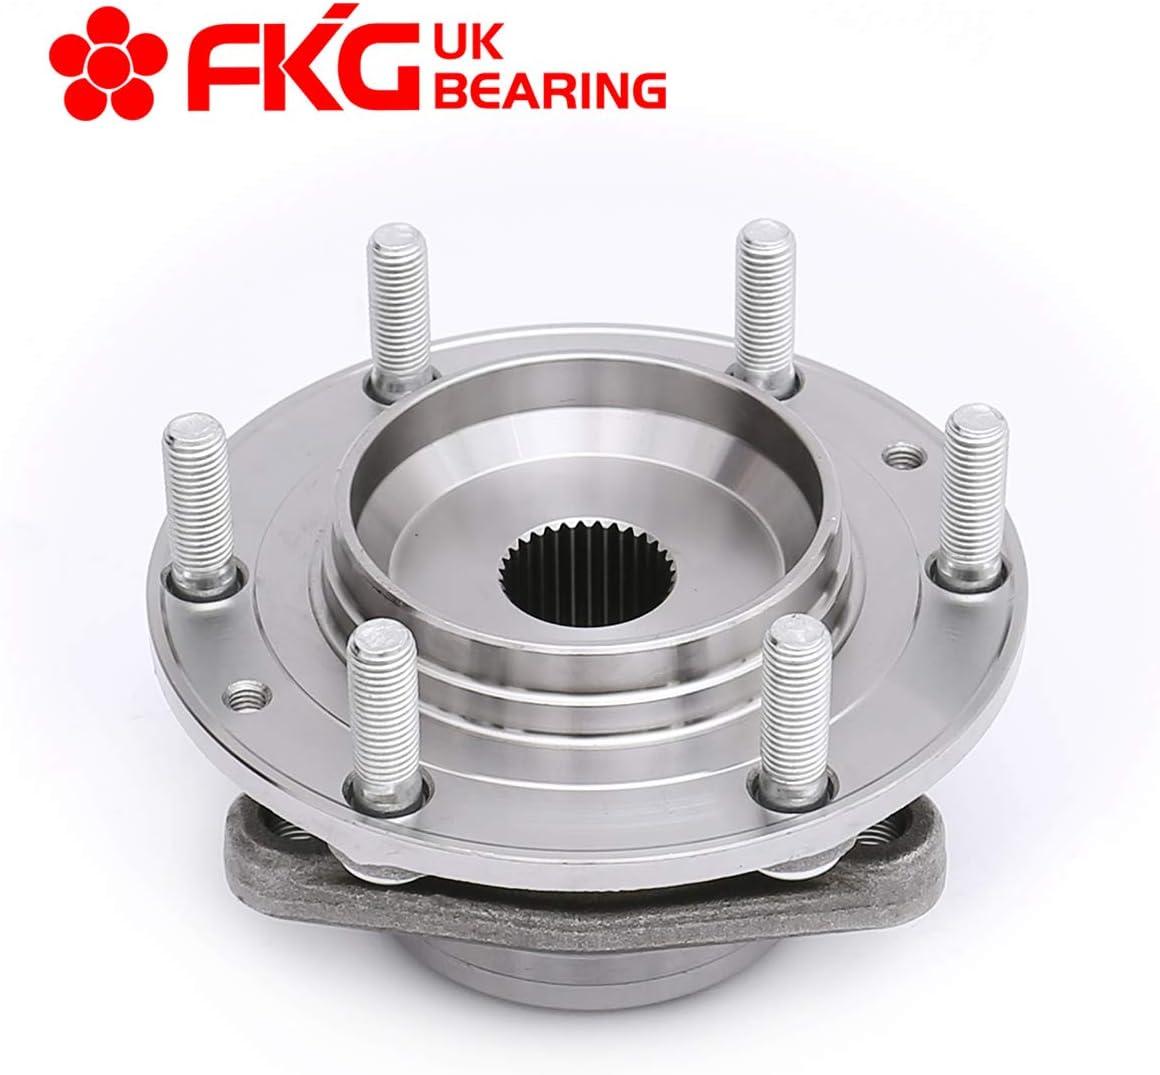 2006-2012 Kia Sedona FKG 515090 Front Wheel Bearing Hub Assembly fit for 2007-2010 Hyundai Entourage 6 Lugs